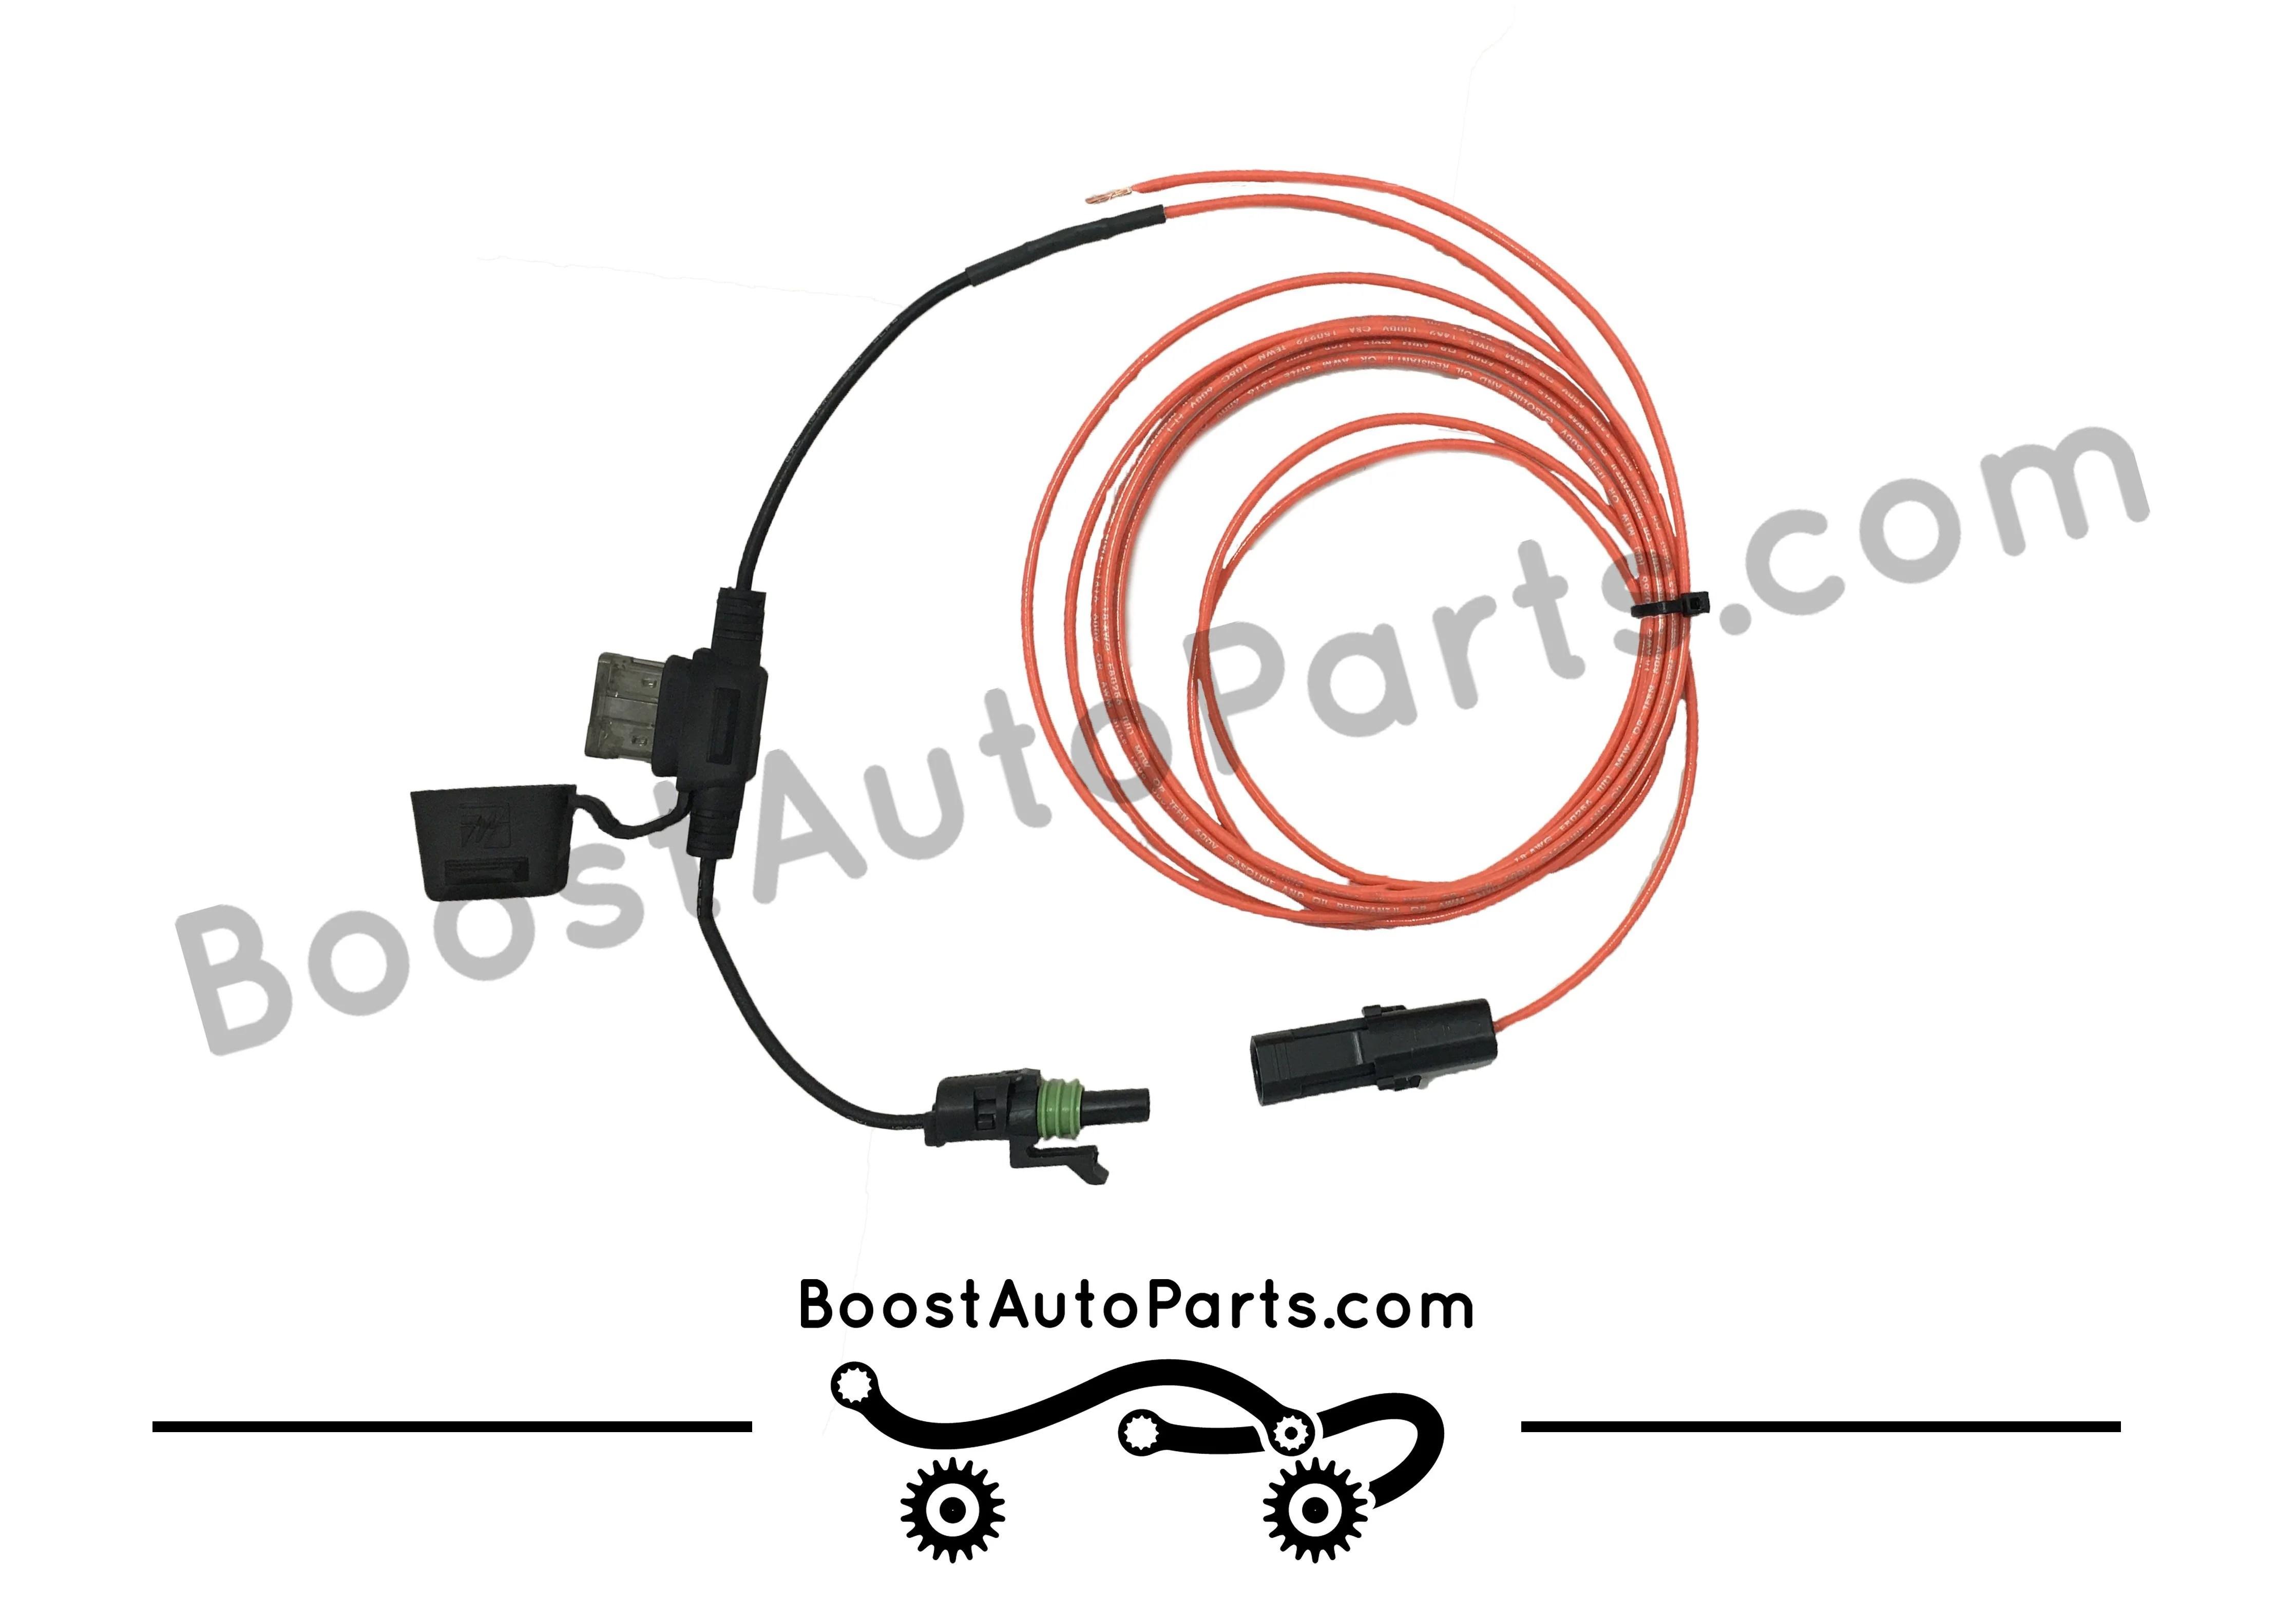 medium resolution of gm wiring harness parts blog wiring diagram gm wire harness parts